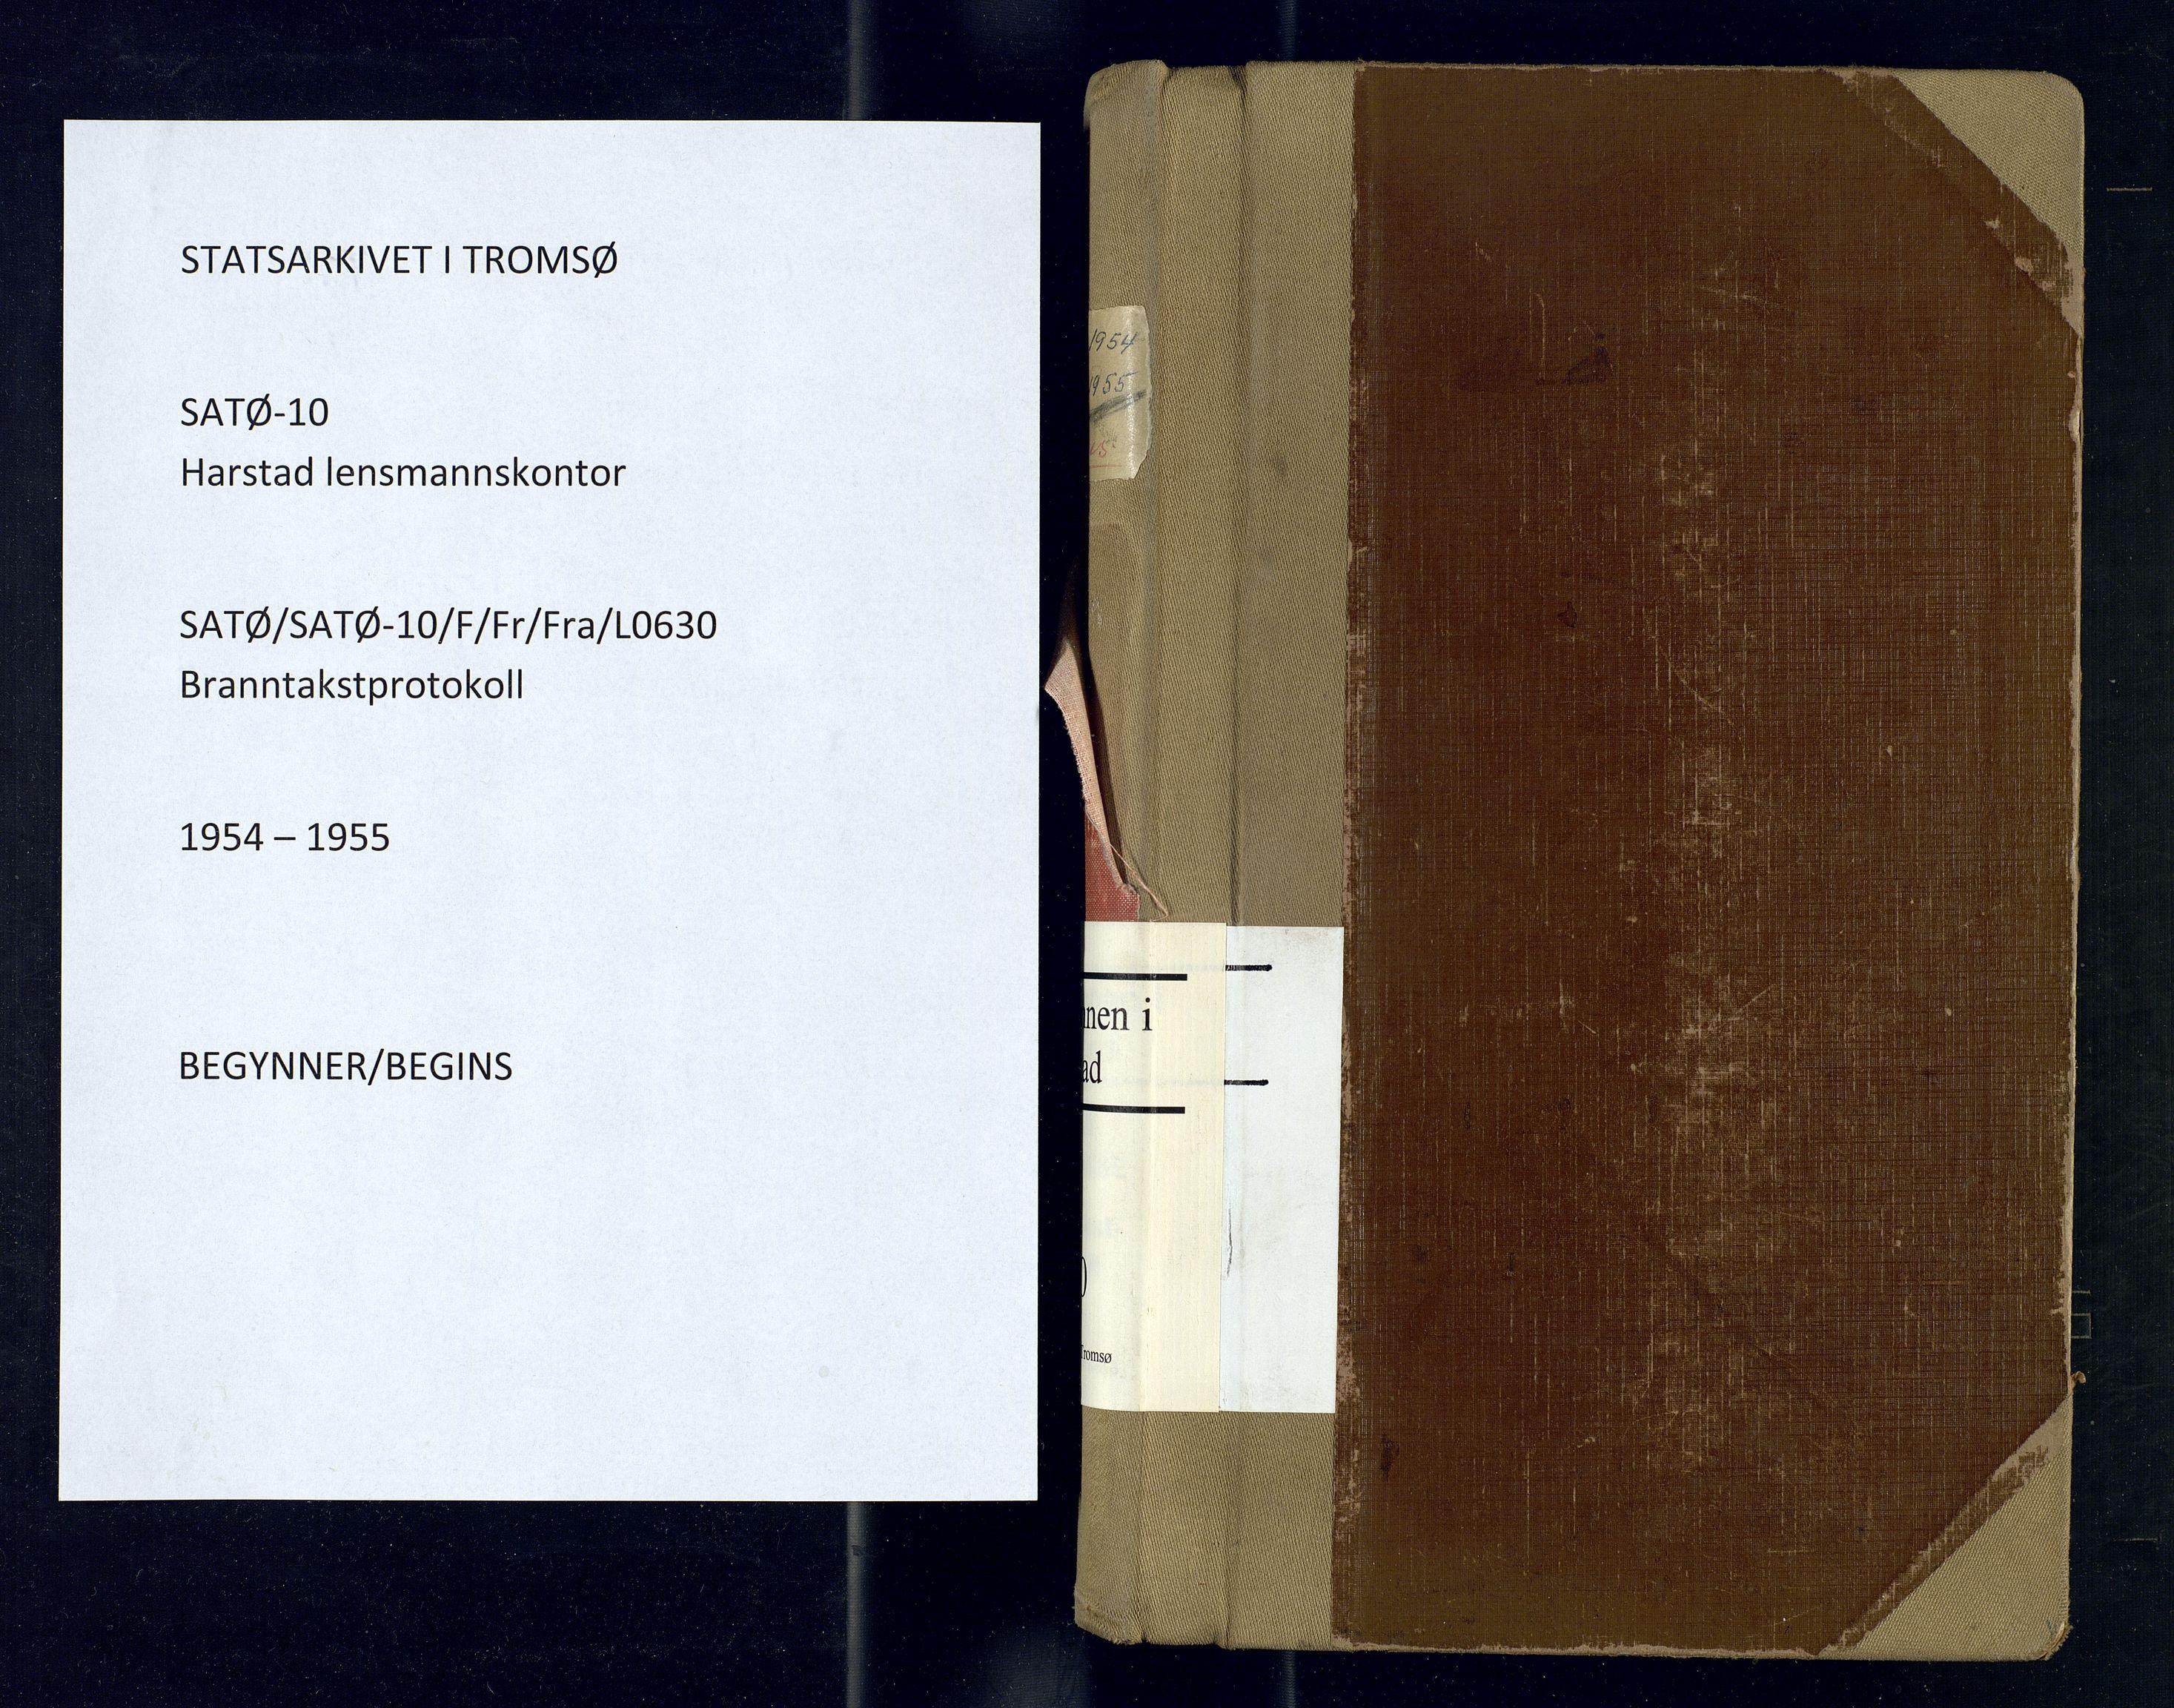 SATØ, Harstad lensmannskontor, F/Fr/Fra/L0630: Branntakstprotokoll, 1954-1955